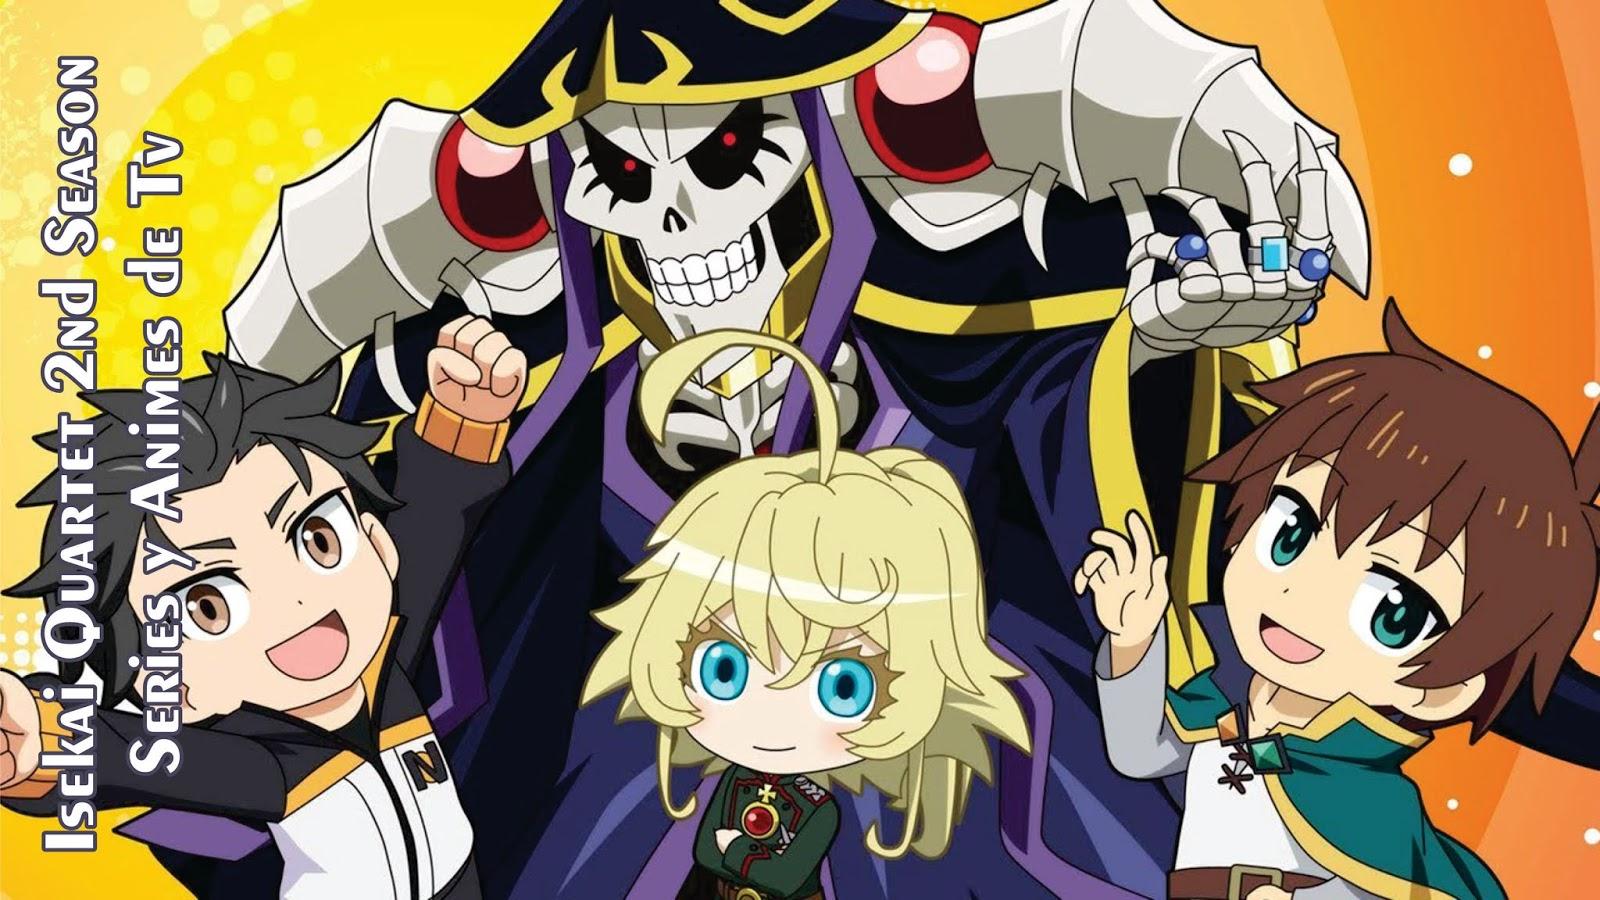 Isekai Quartet 2nd Season - 12 / 12 - AnimeSyA | Ver ...